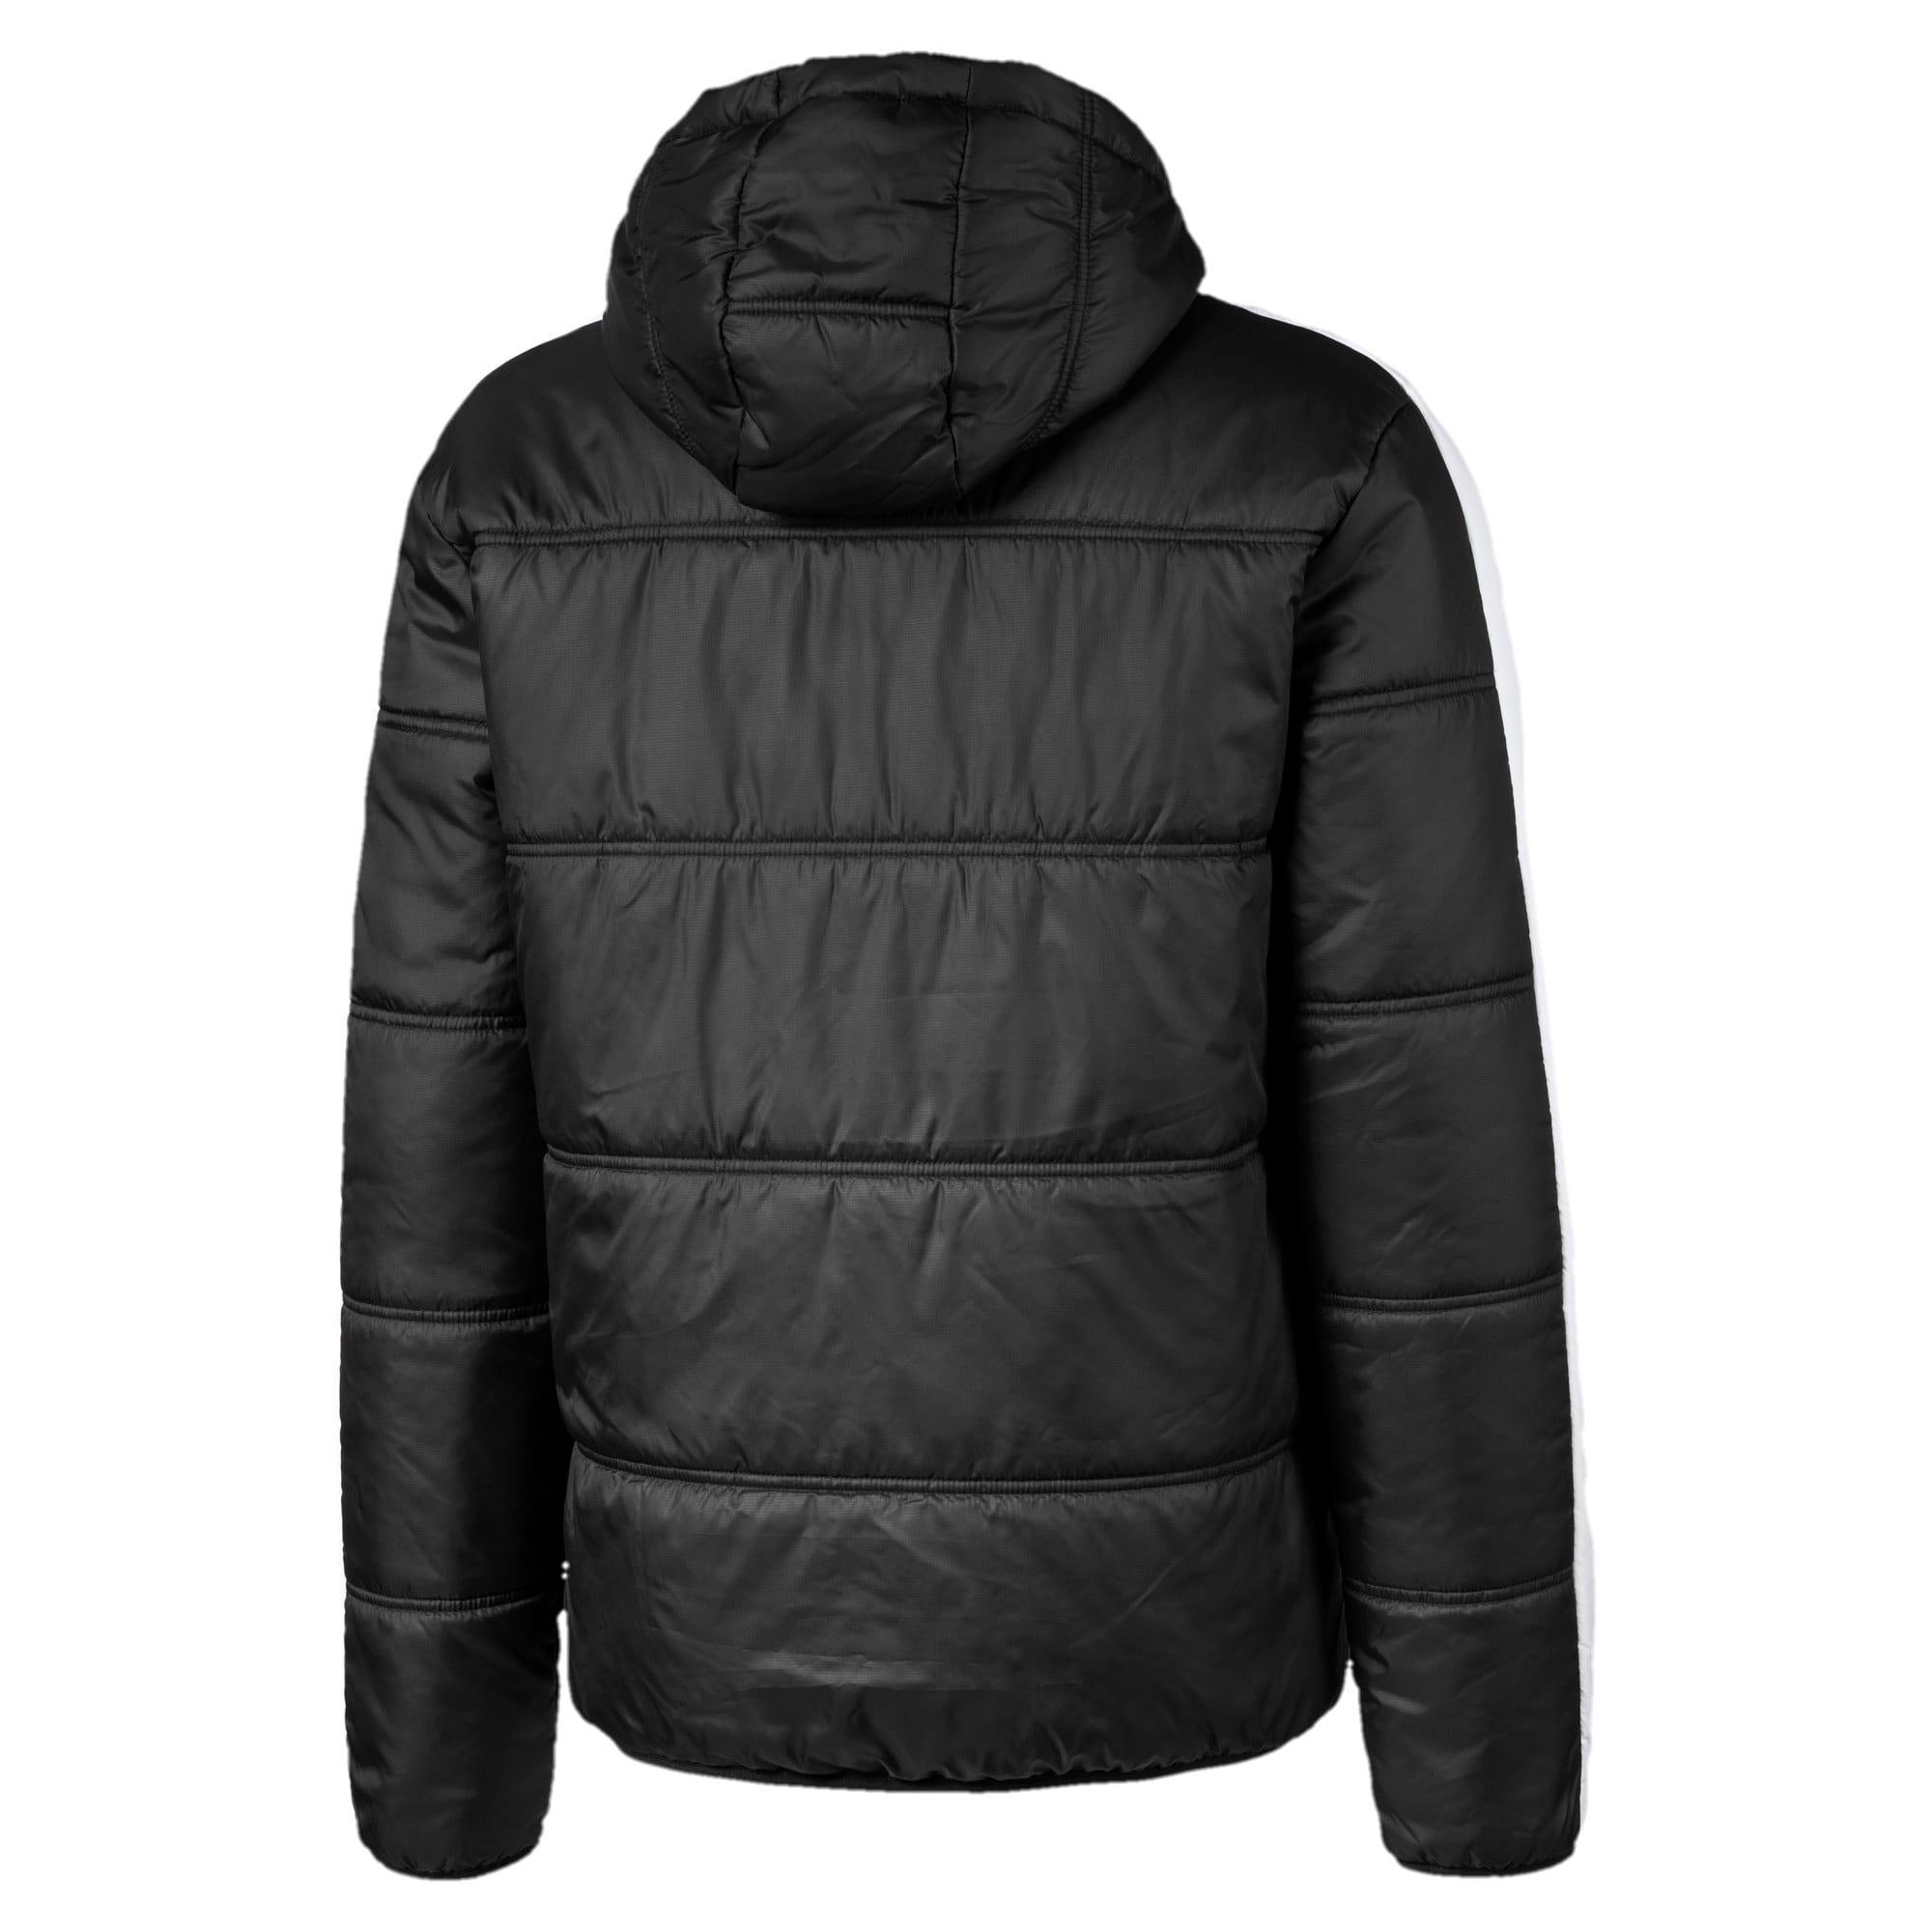 Thumbnail 2 of Classics T7 Padded Men's Jacket, Puma Black, medium